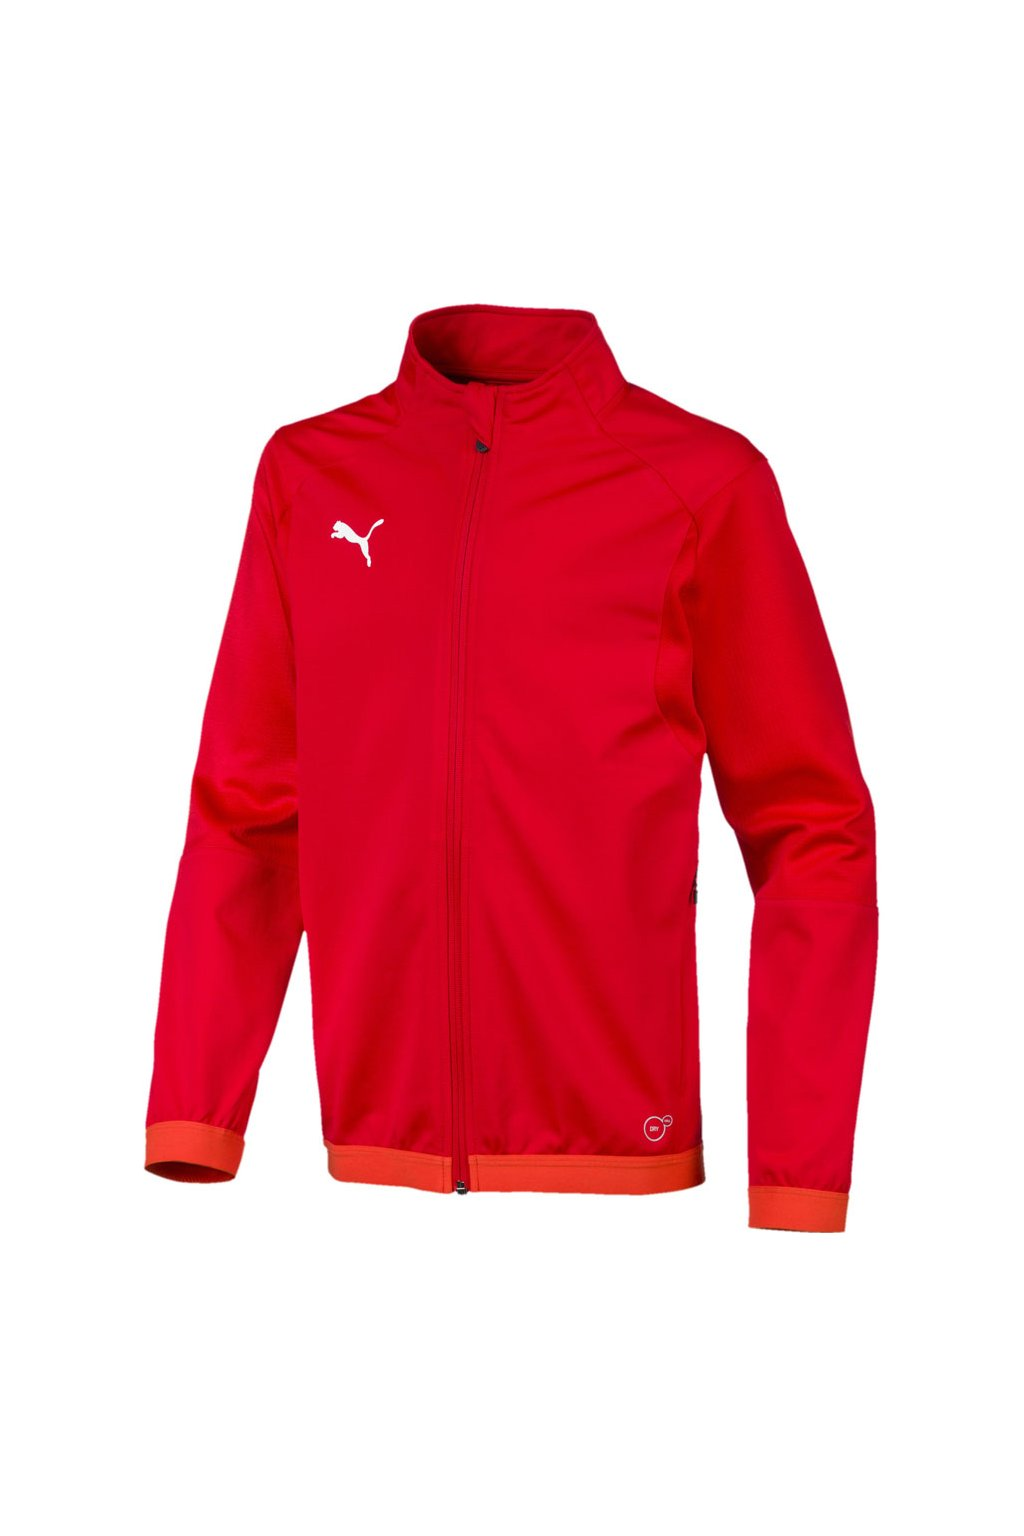 Detská mikina Puma Liga Training Jacket JUNIOR červená 655688 01